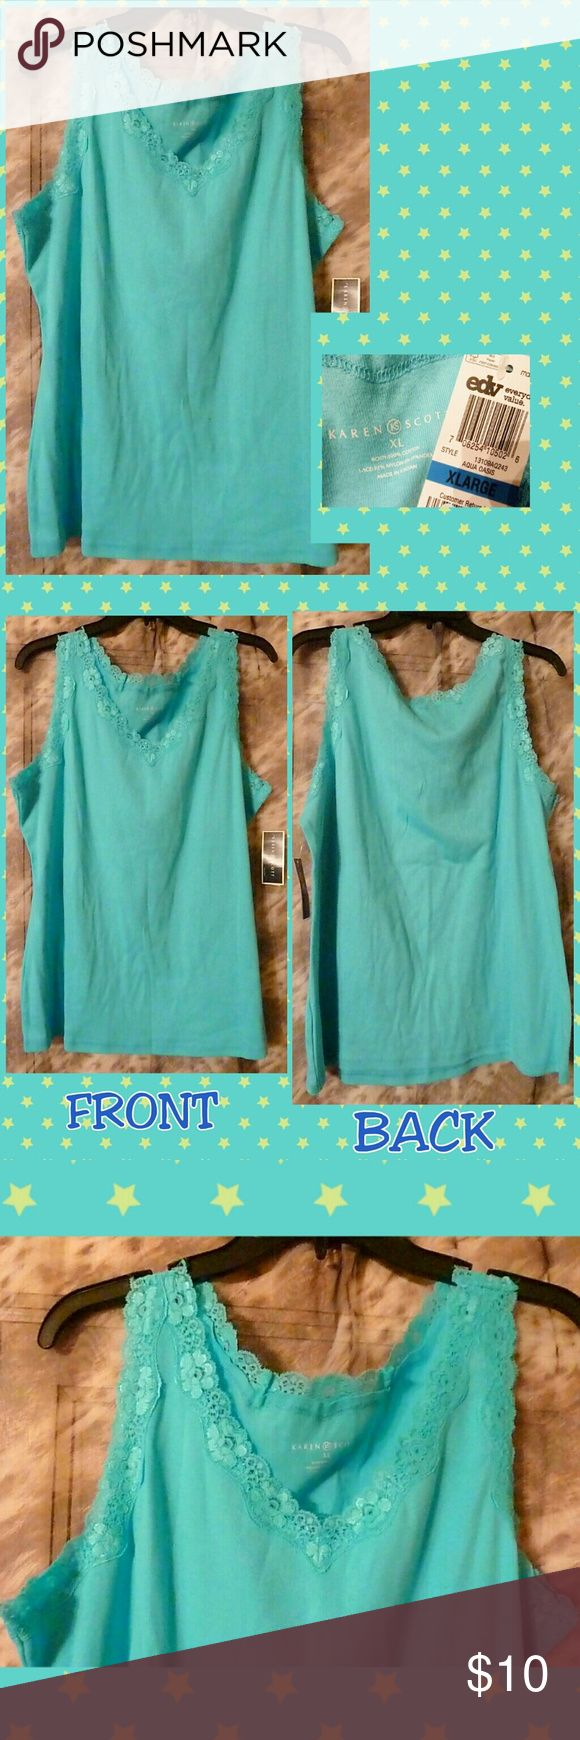 Selling this Aqua Oasis W/Lace Trim Knit Tank Top Sz XL on Poshmark! My username is: gothicbluecj. #shopmycloset #poshmark #fashion #shopping #style #forsale #Karen Scott #Tops